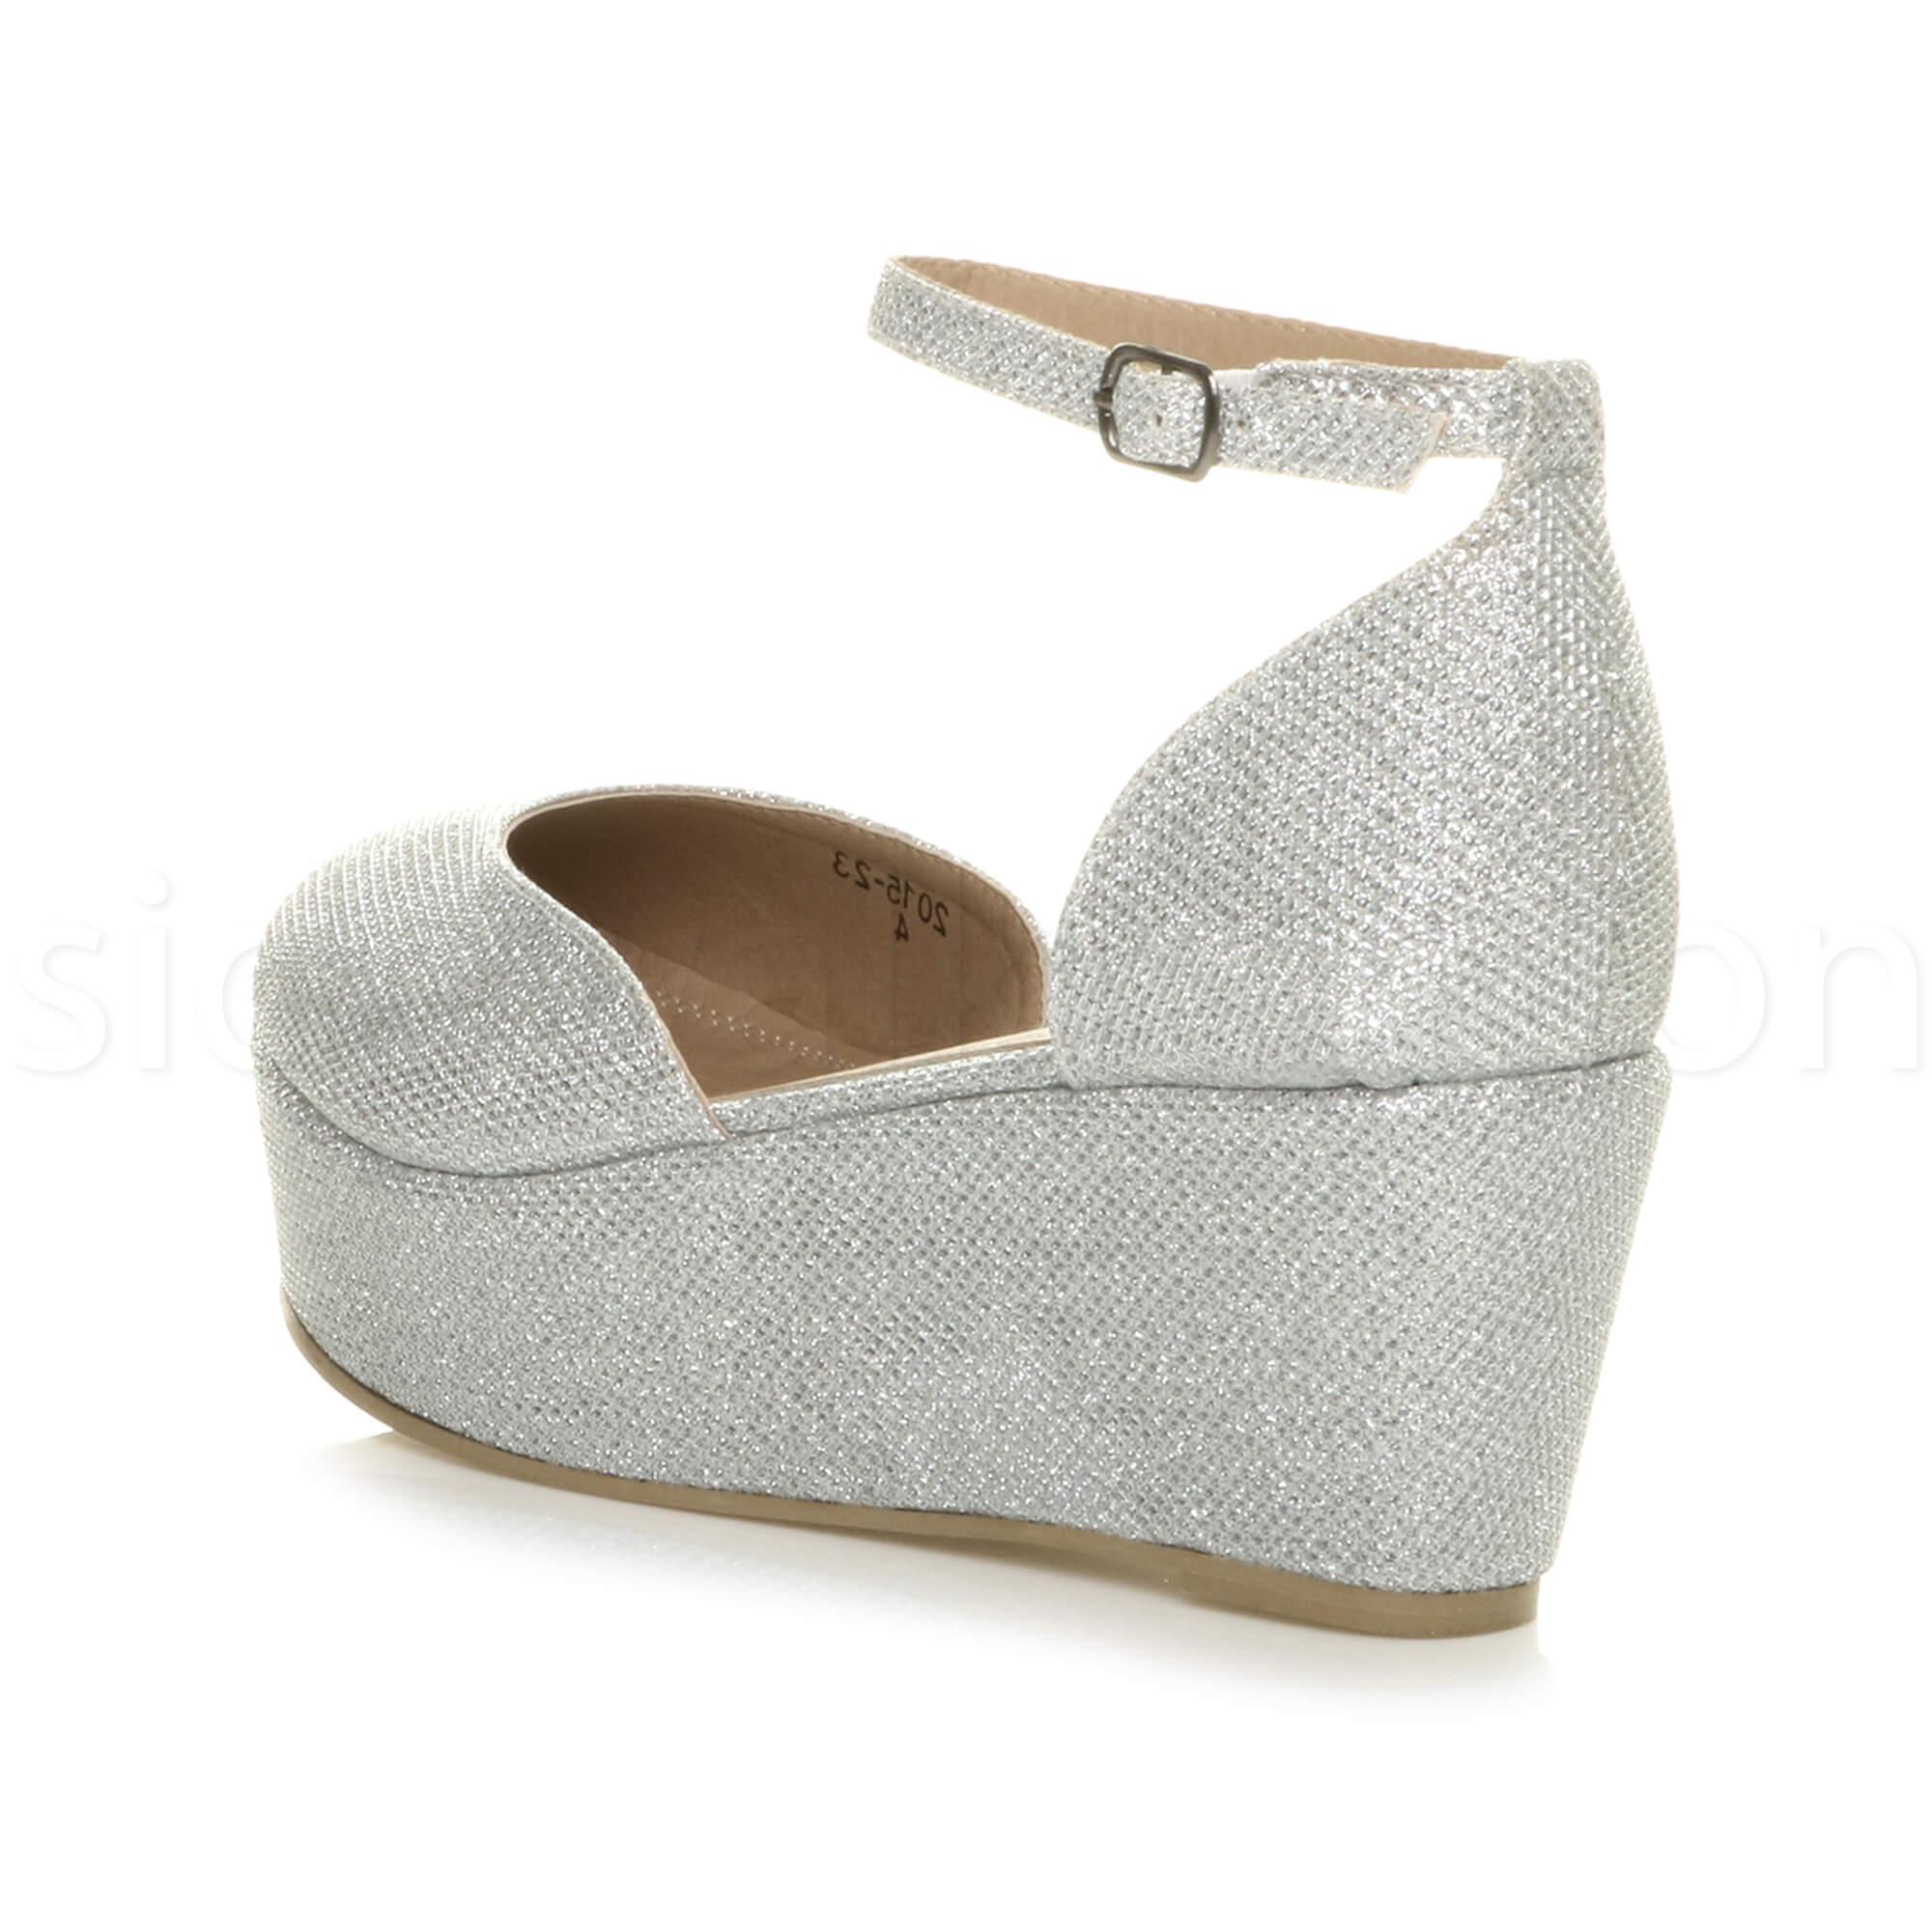 Womens-ladies-flatform-mid-wedge-ankle-strap-platform-court-shoes-sandals-size thumbnail 69